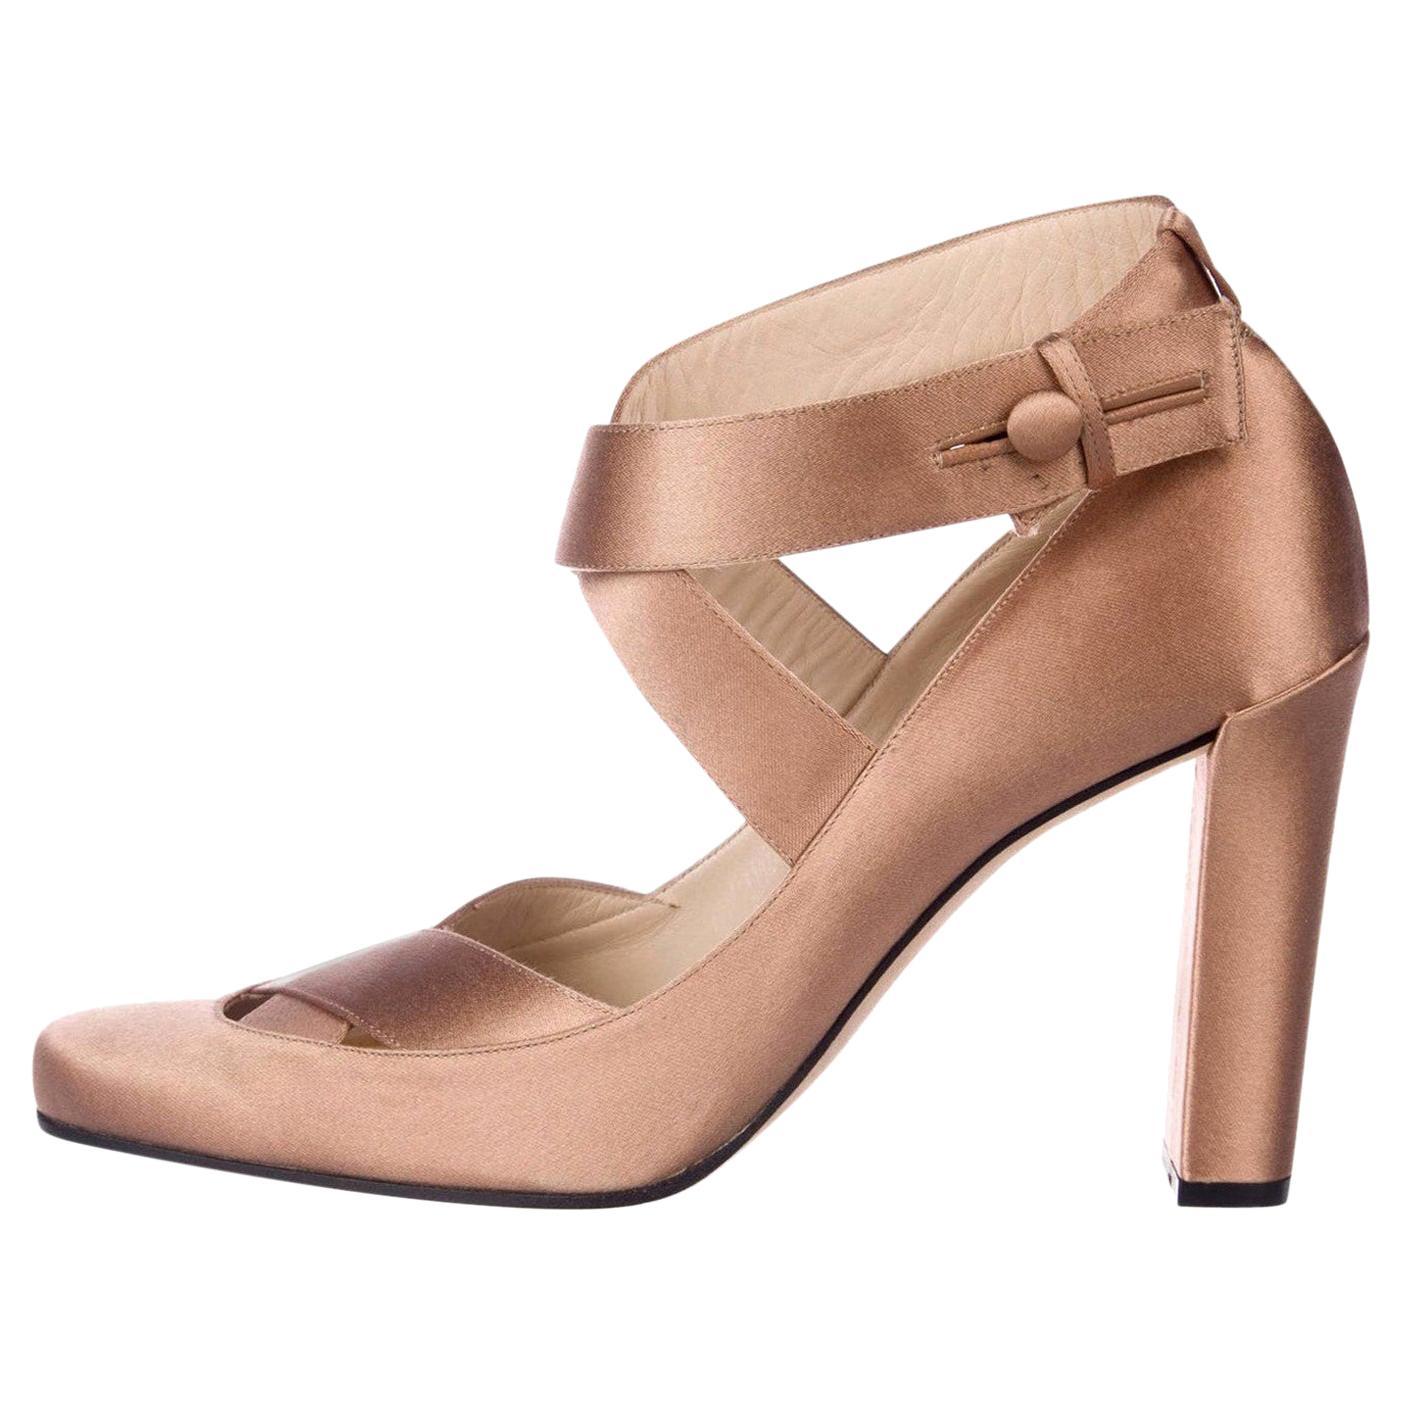 New Rare Tom Ford for Gucci Satin Ballerina Ad Runway Heels Pumps Sz 40.5